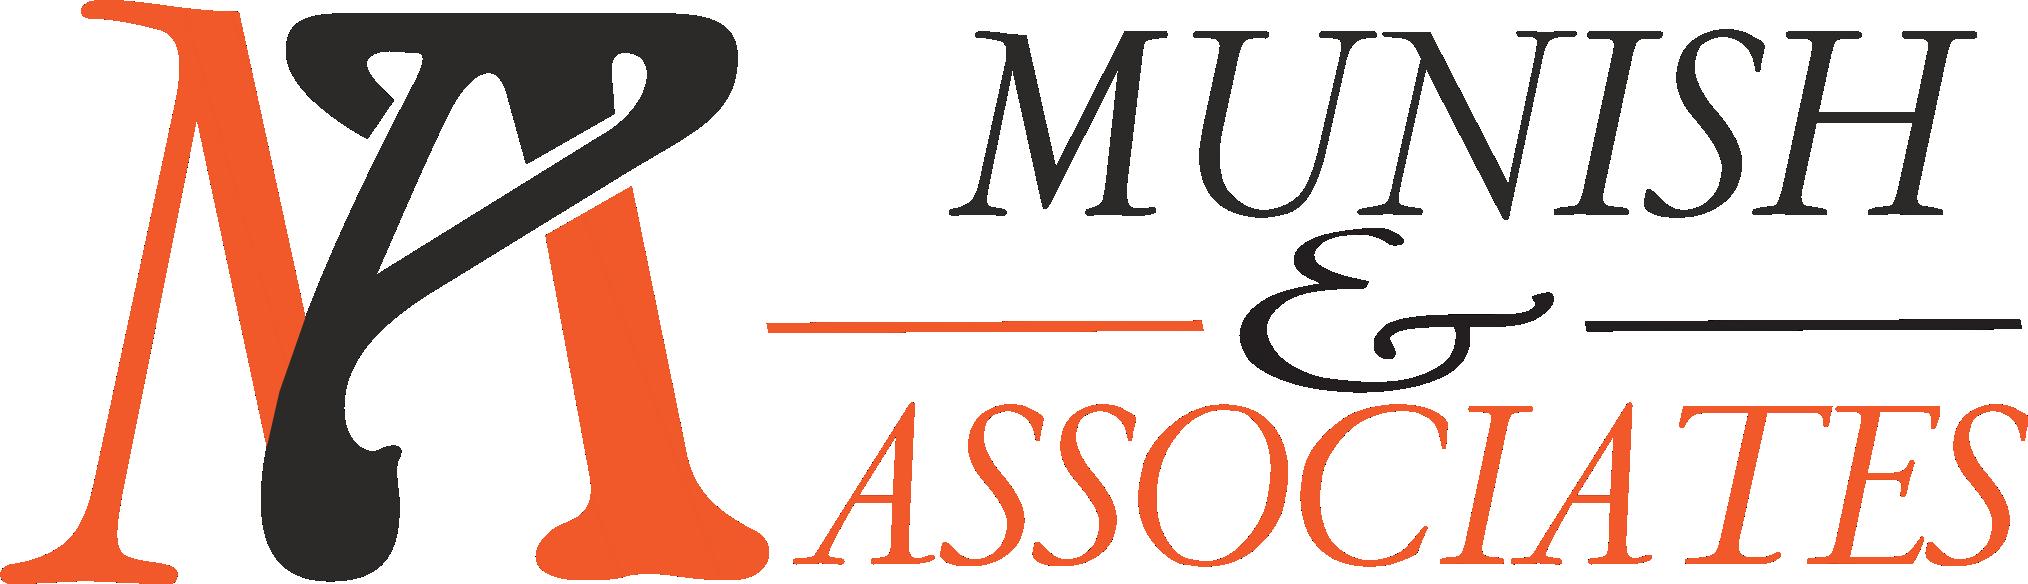 Munish and Associates